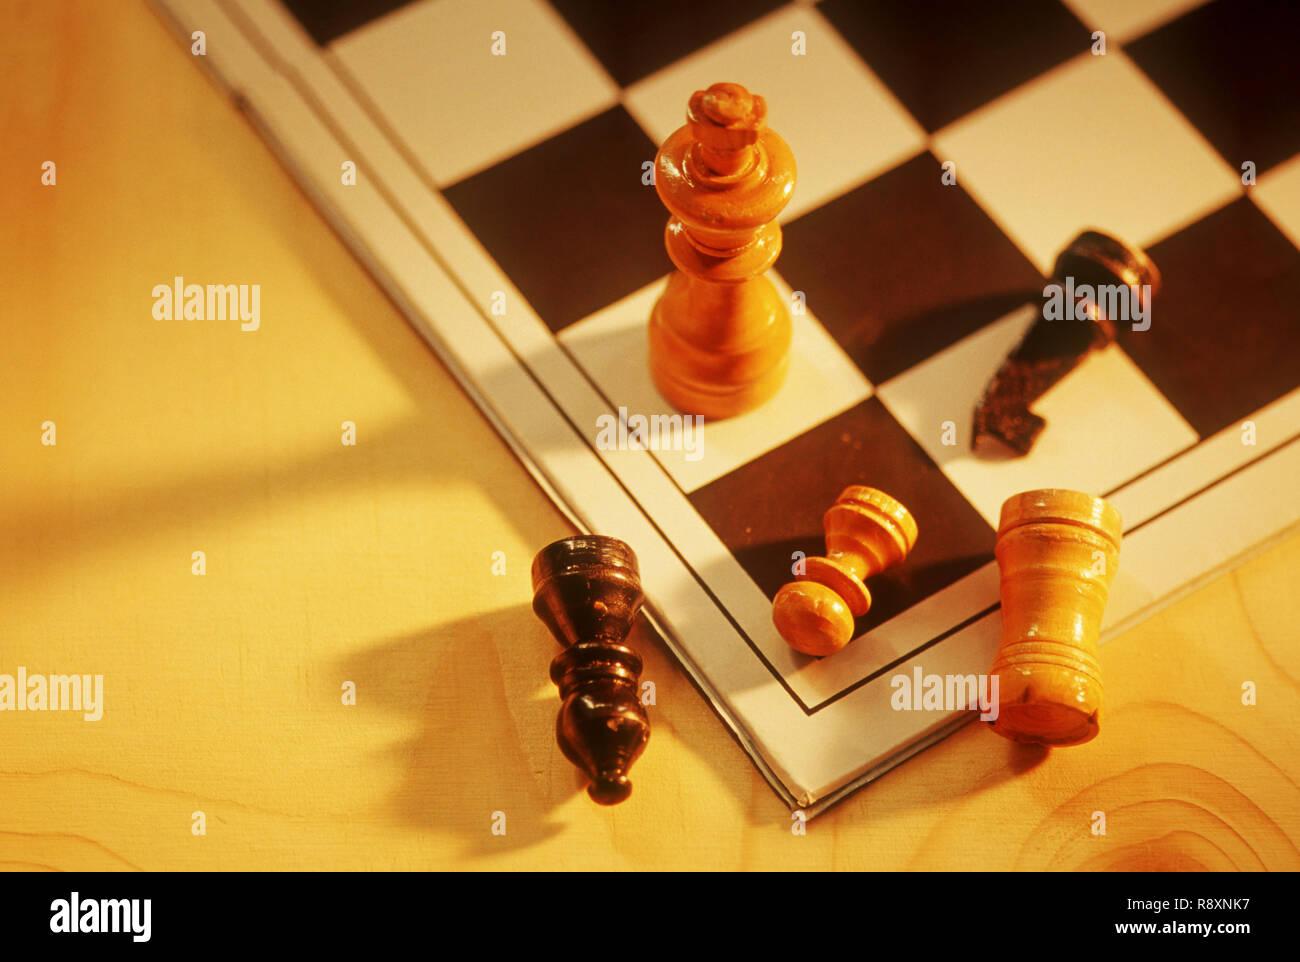 Touches d'échecs, Concept Photo Stock